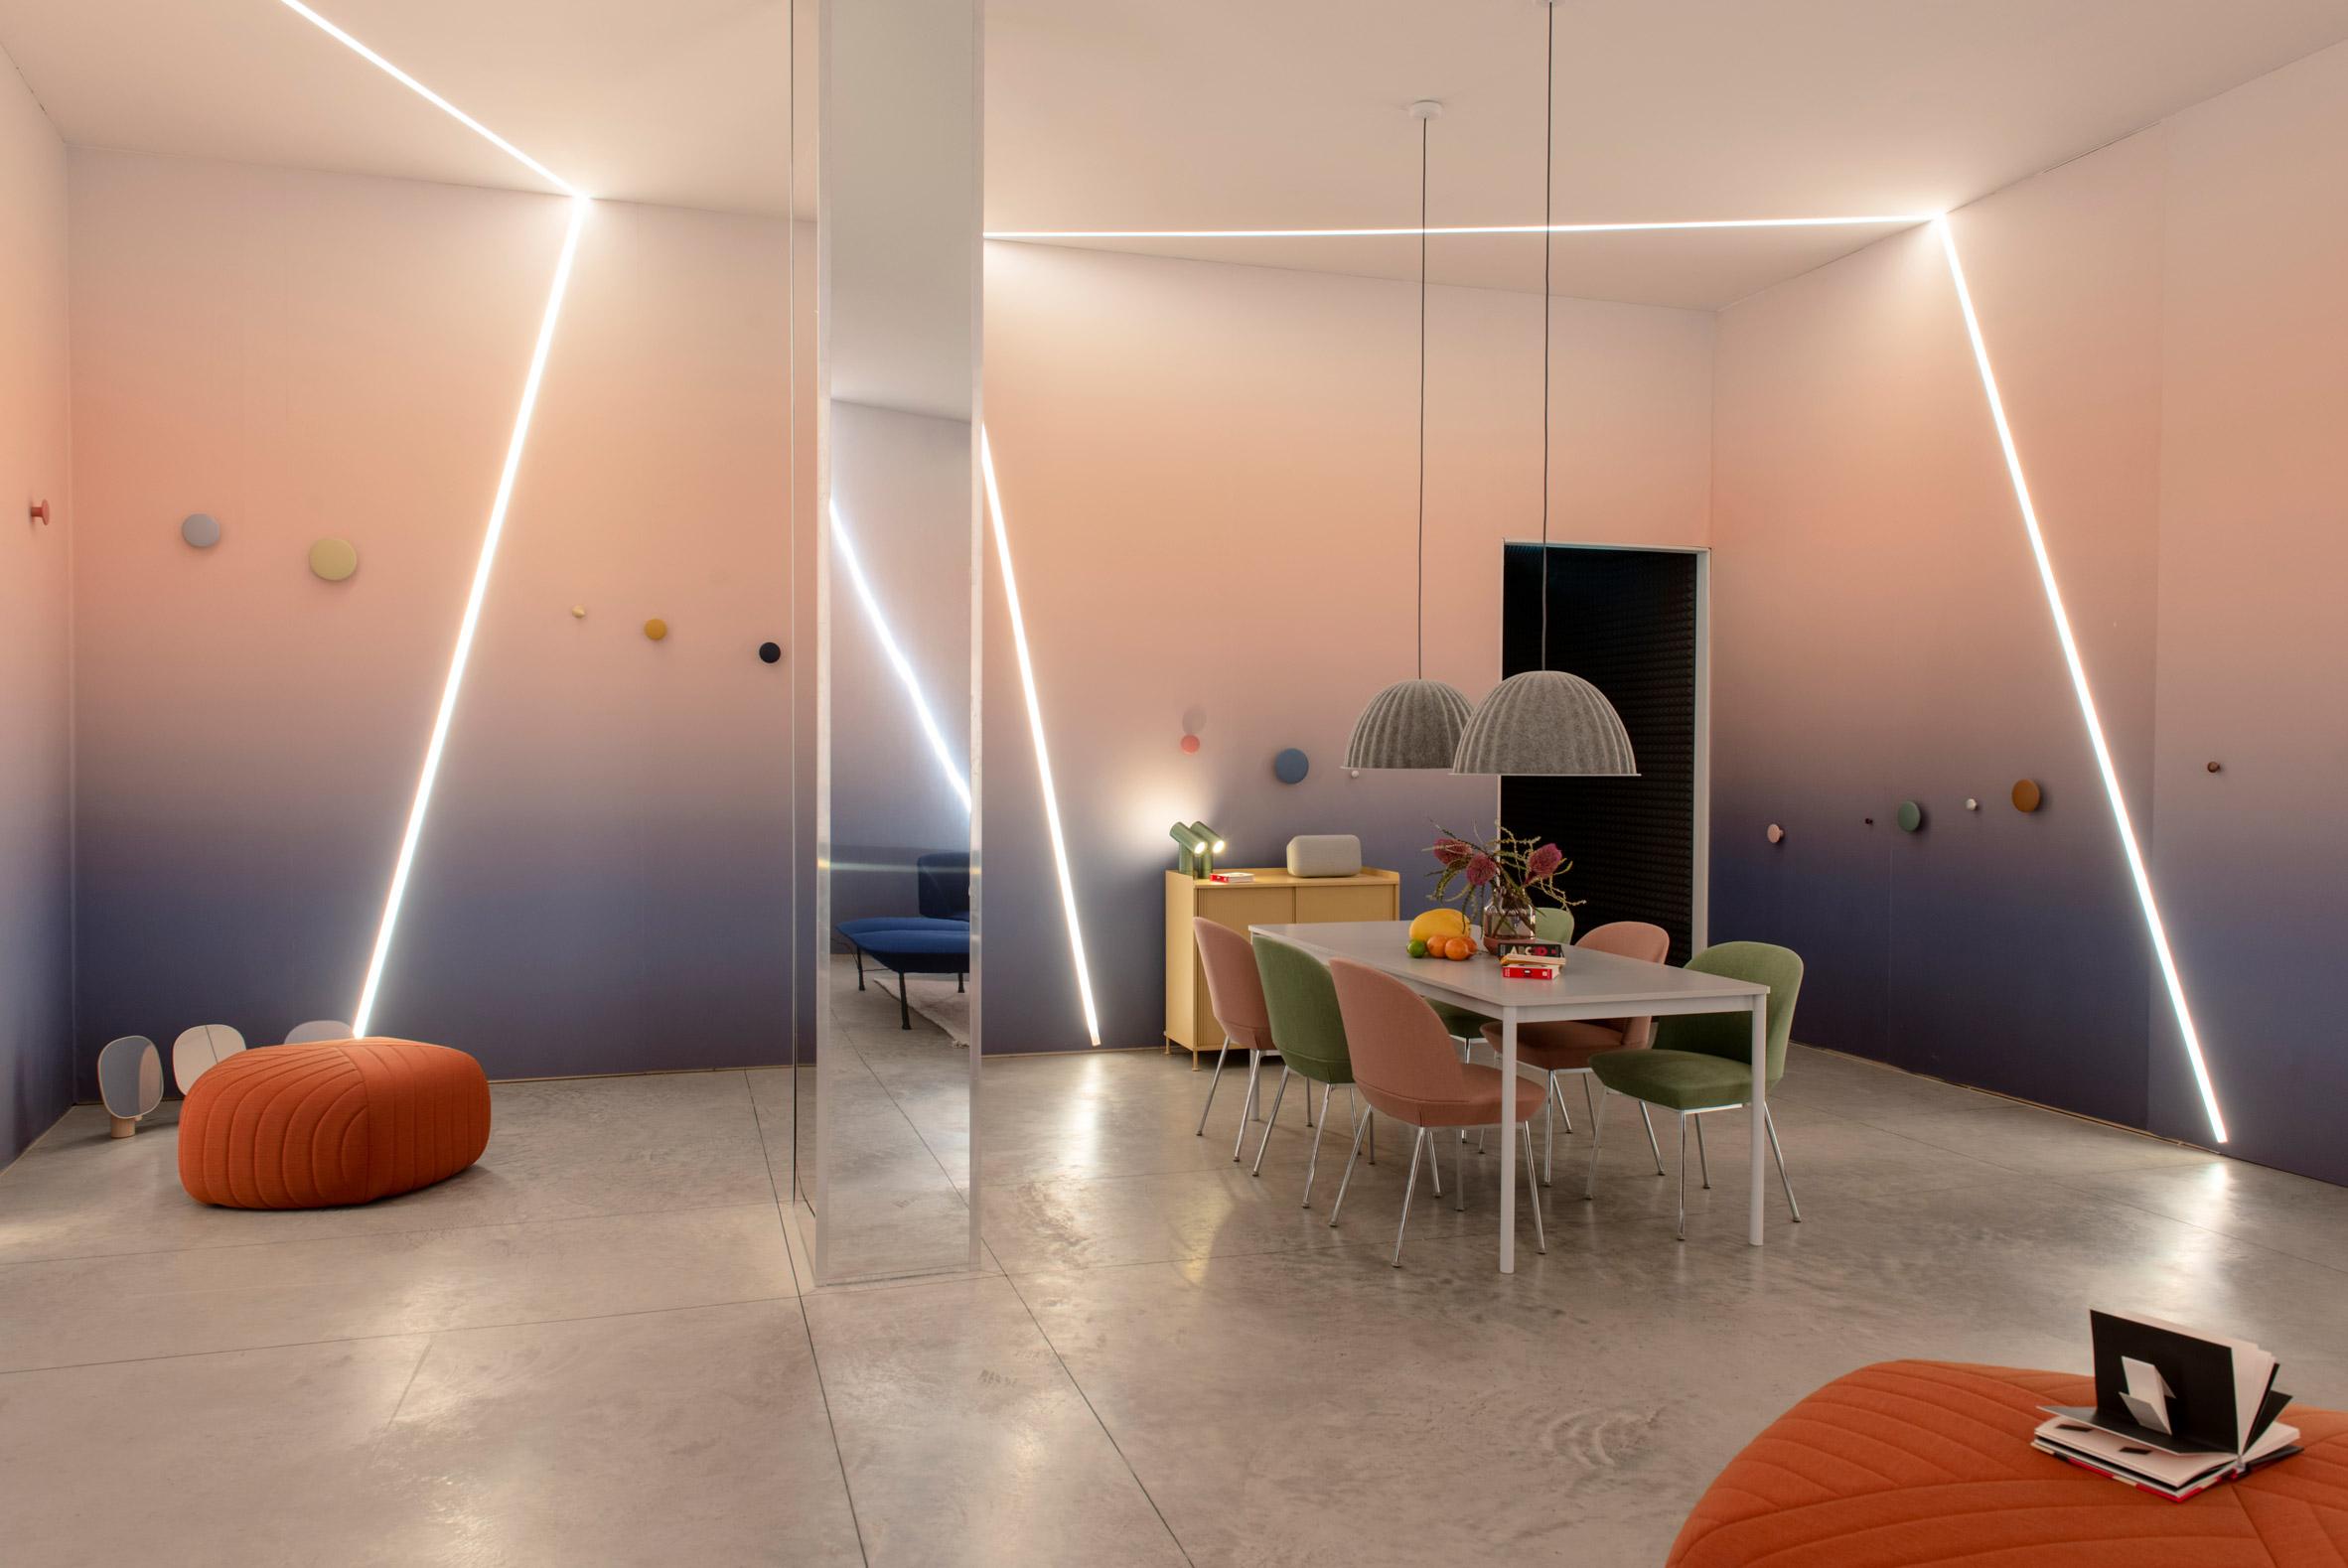 google-muuto-a-space-for-being-design_dezeen_2364_col_16.jpg